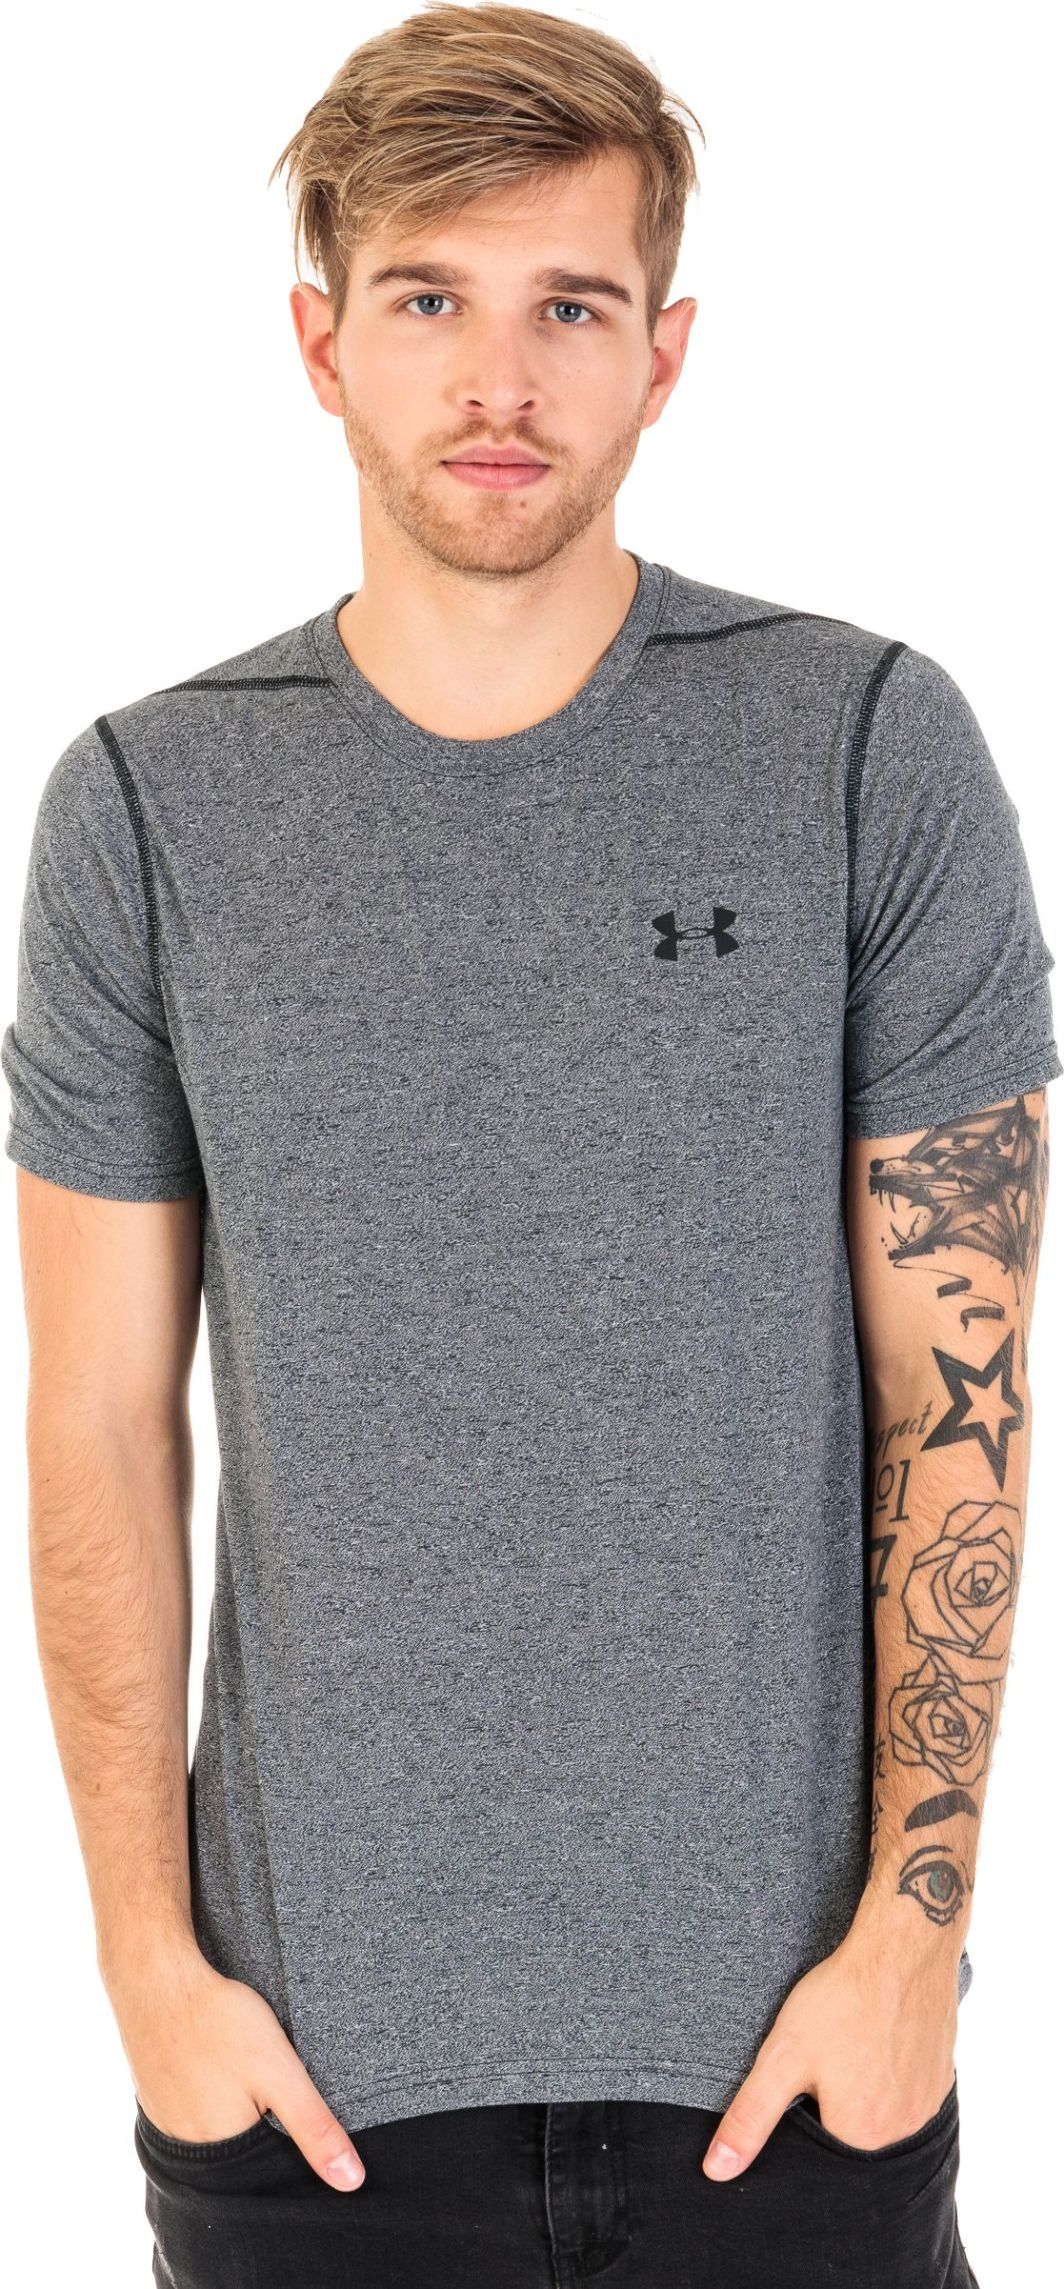 Under Armour Koszulka męska Threadborne T-Shirt Black/Graphite r. XL (1289588006) 1